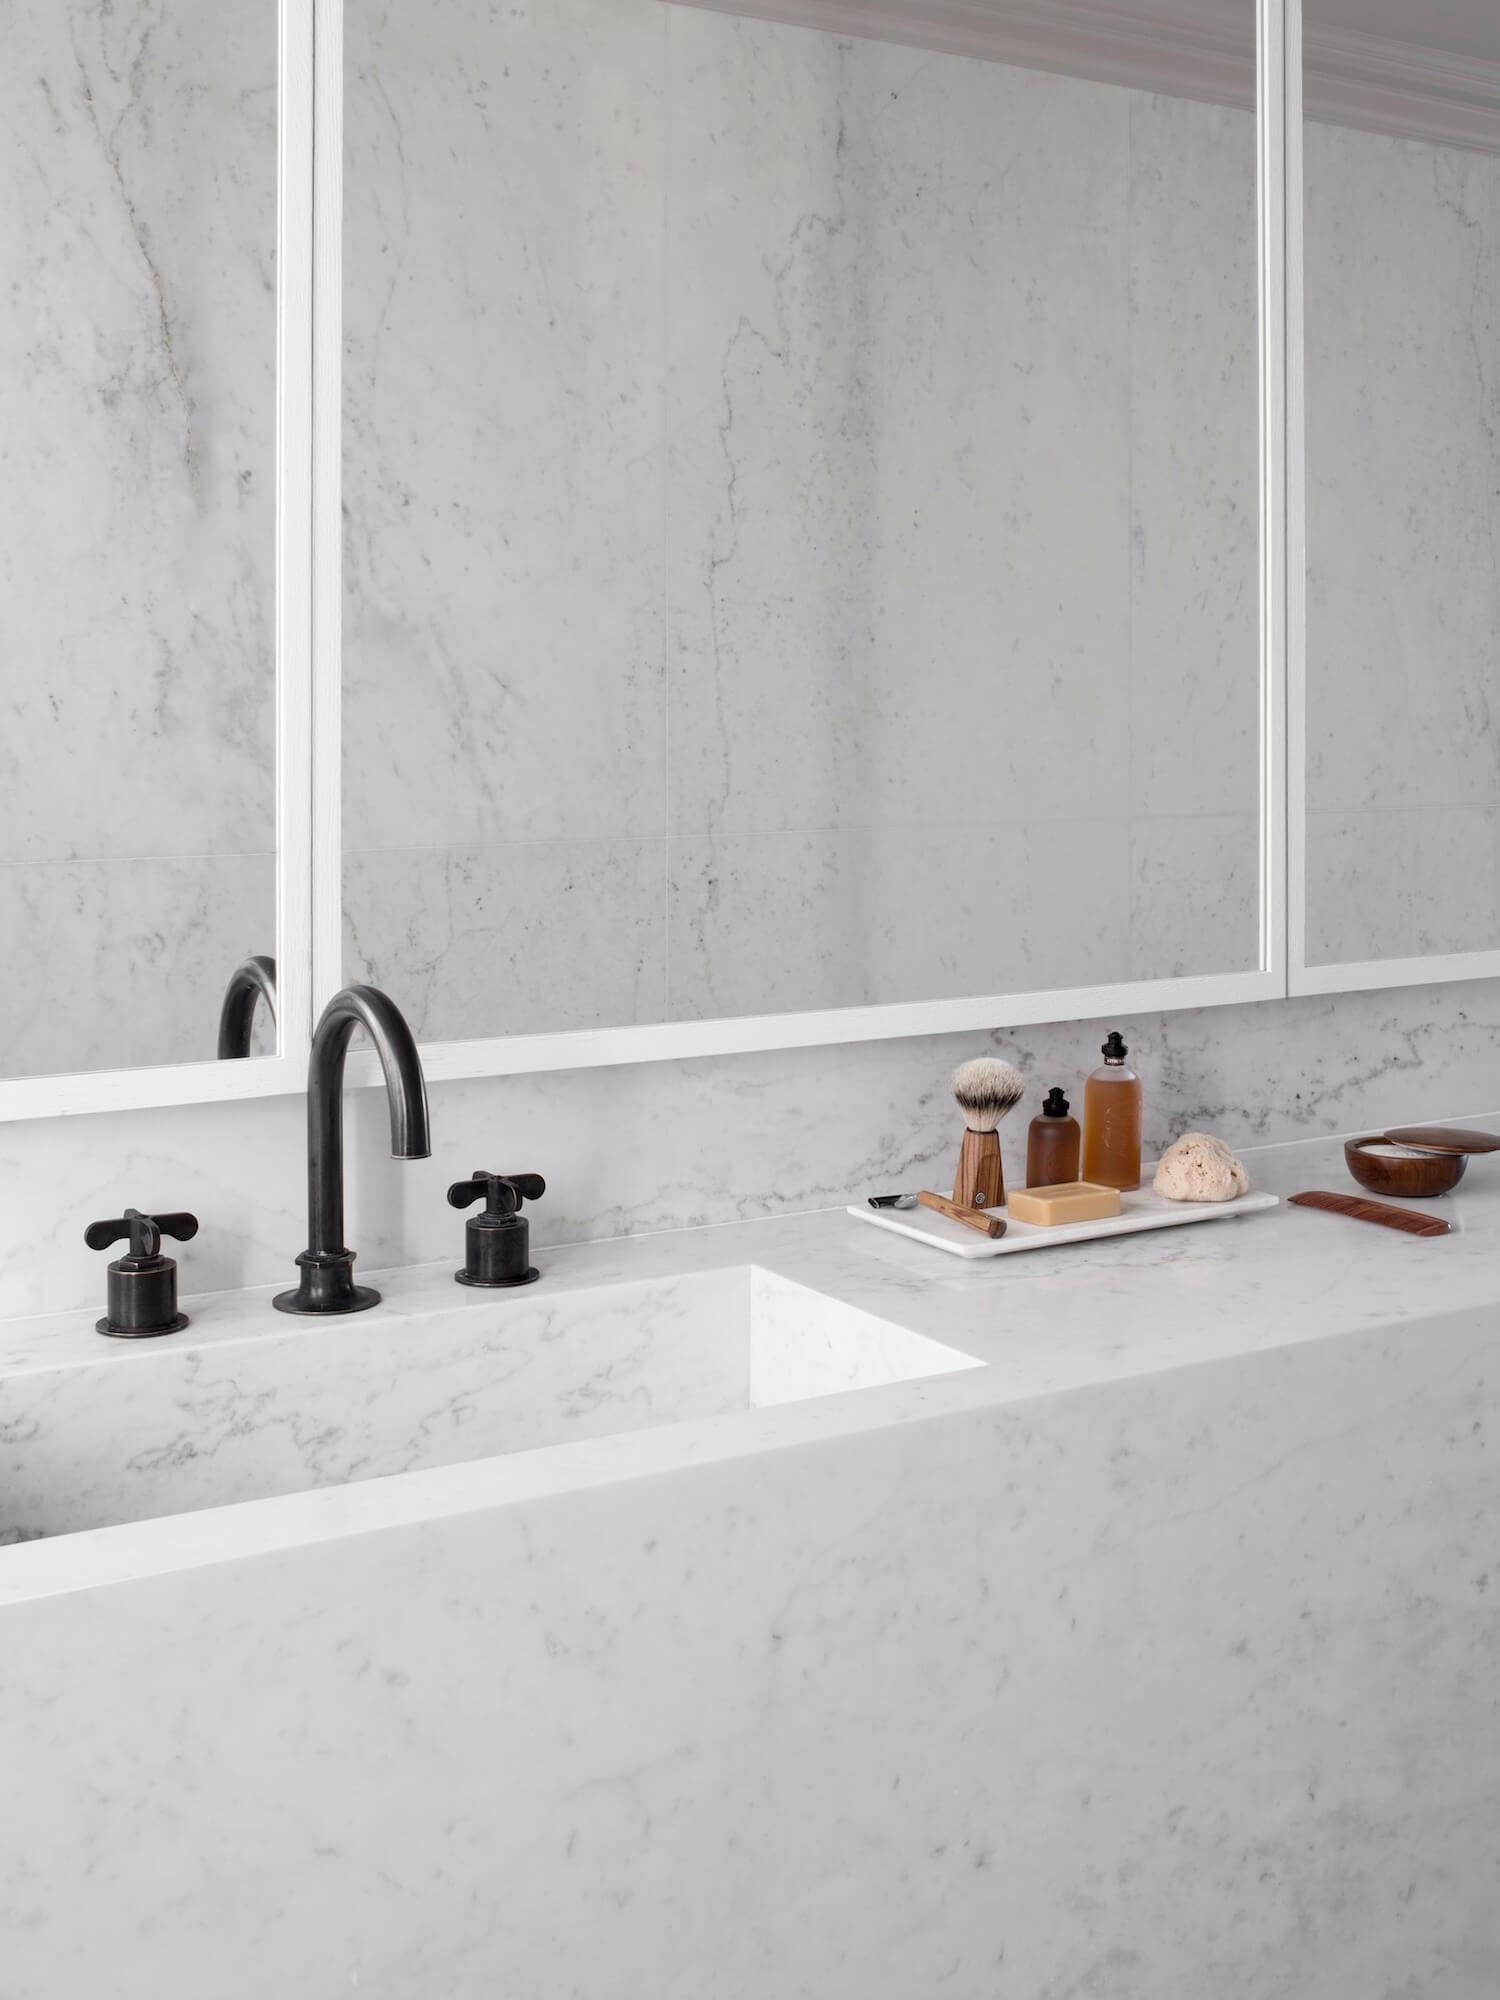 phong cách tối giản elledecoration vietnam-paris-apartment-guillaume-alan10